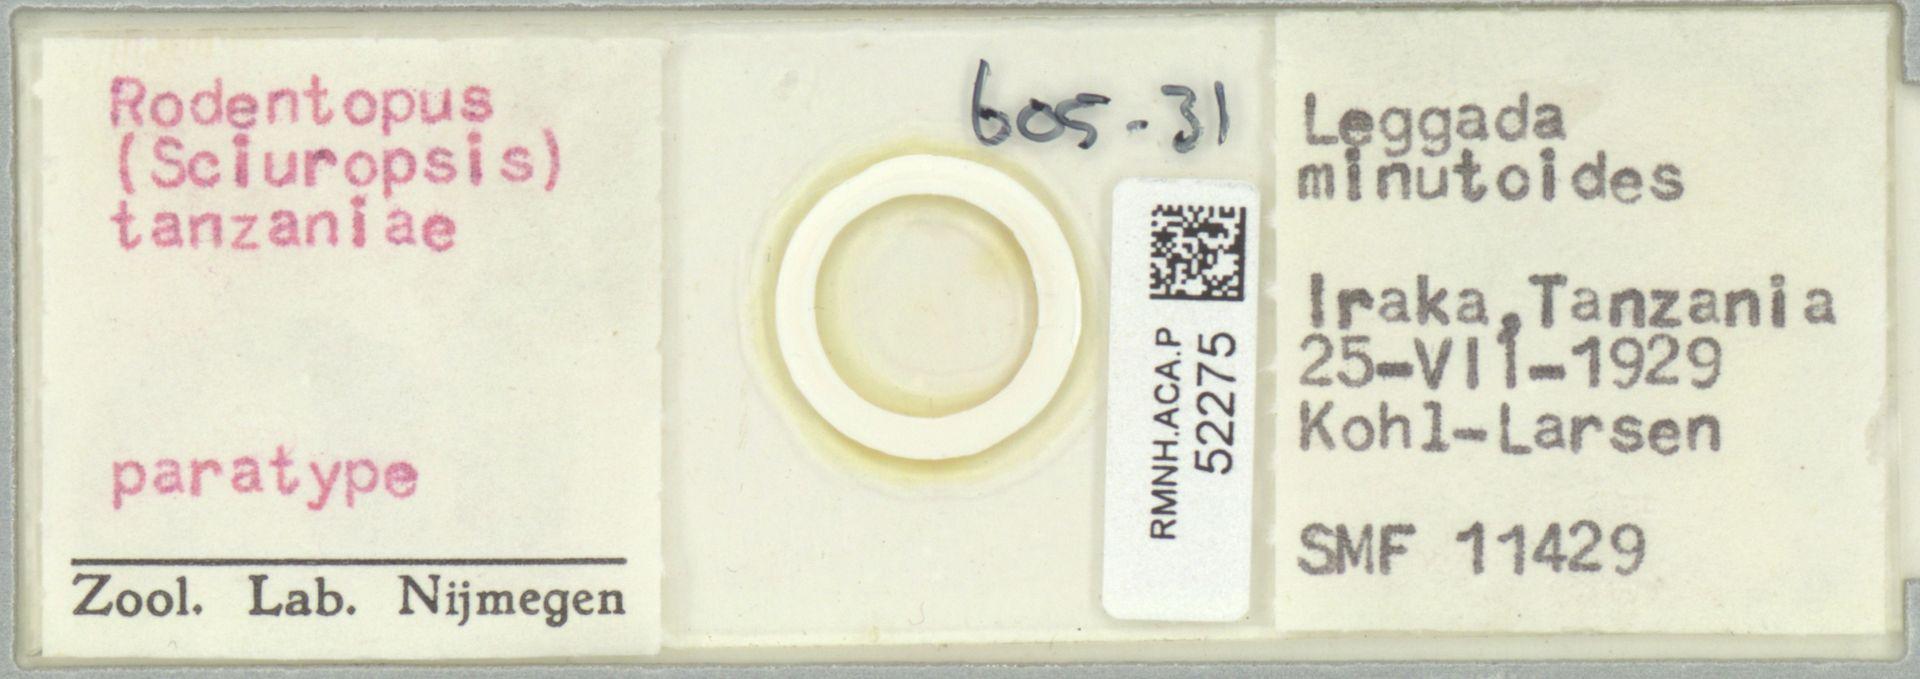 RMNH.ACA.P.52275 | Rodentopus (Sciuropsis) tanzaniae